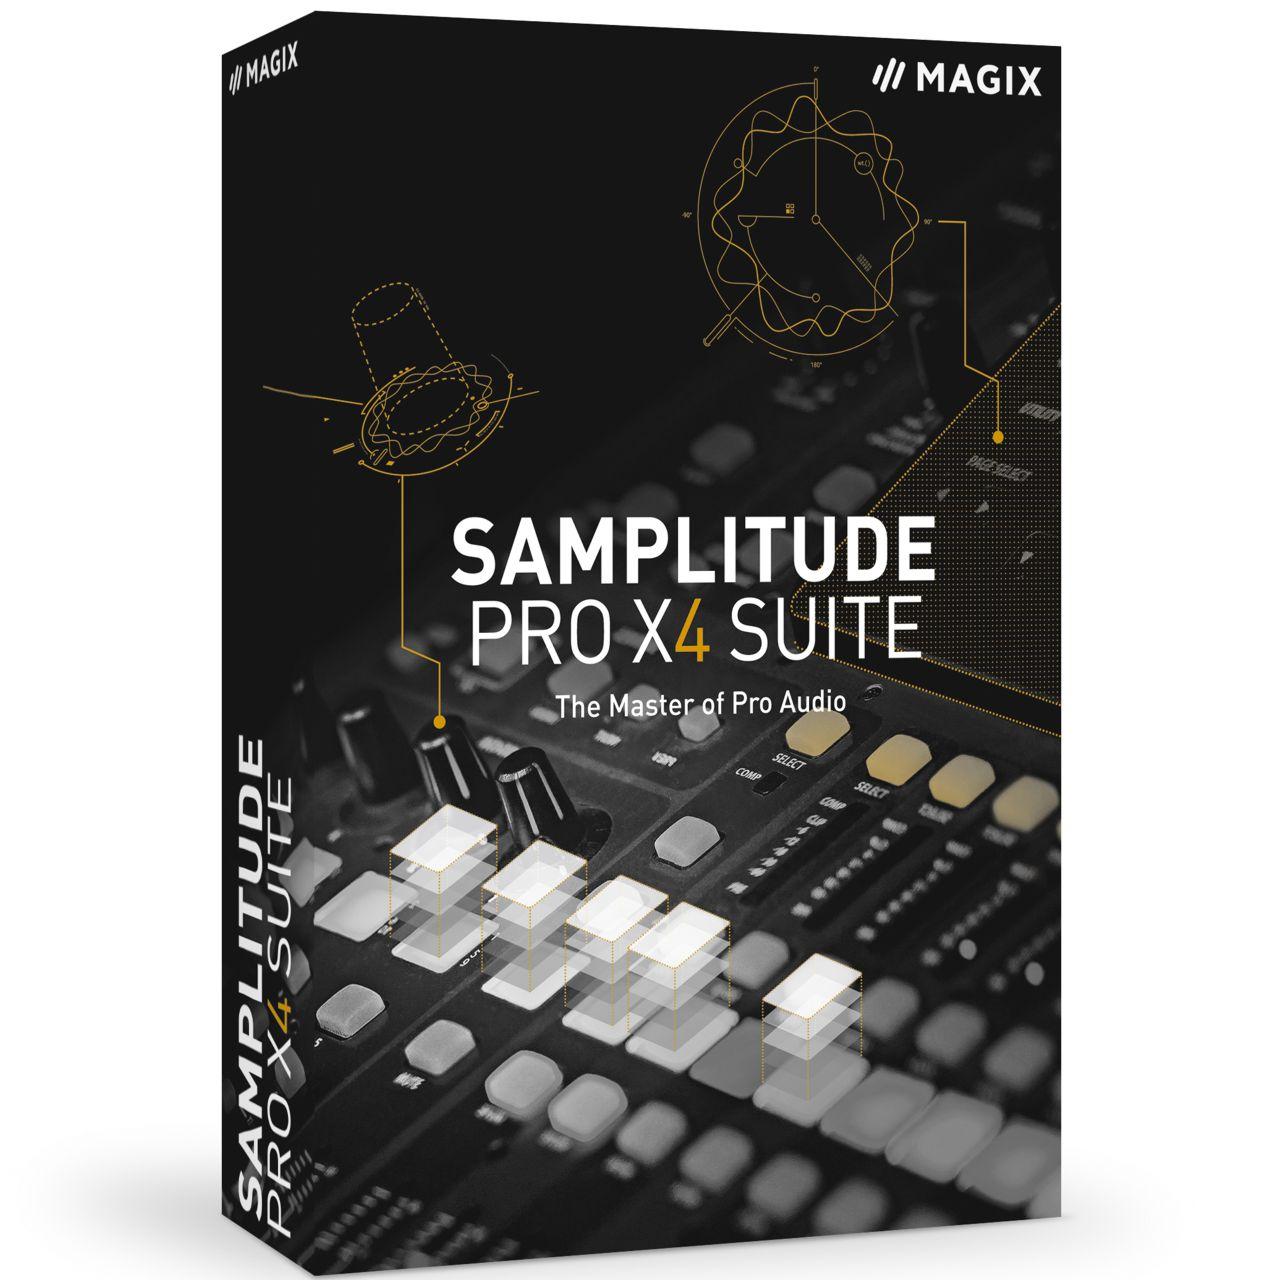 Samplitude-Pro-X4-Suite.jpg